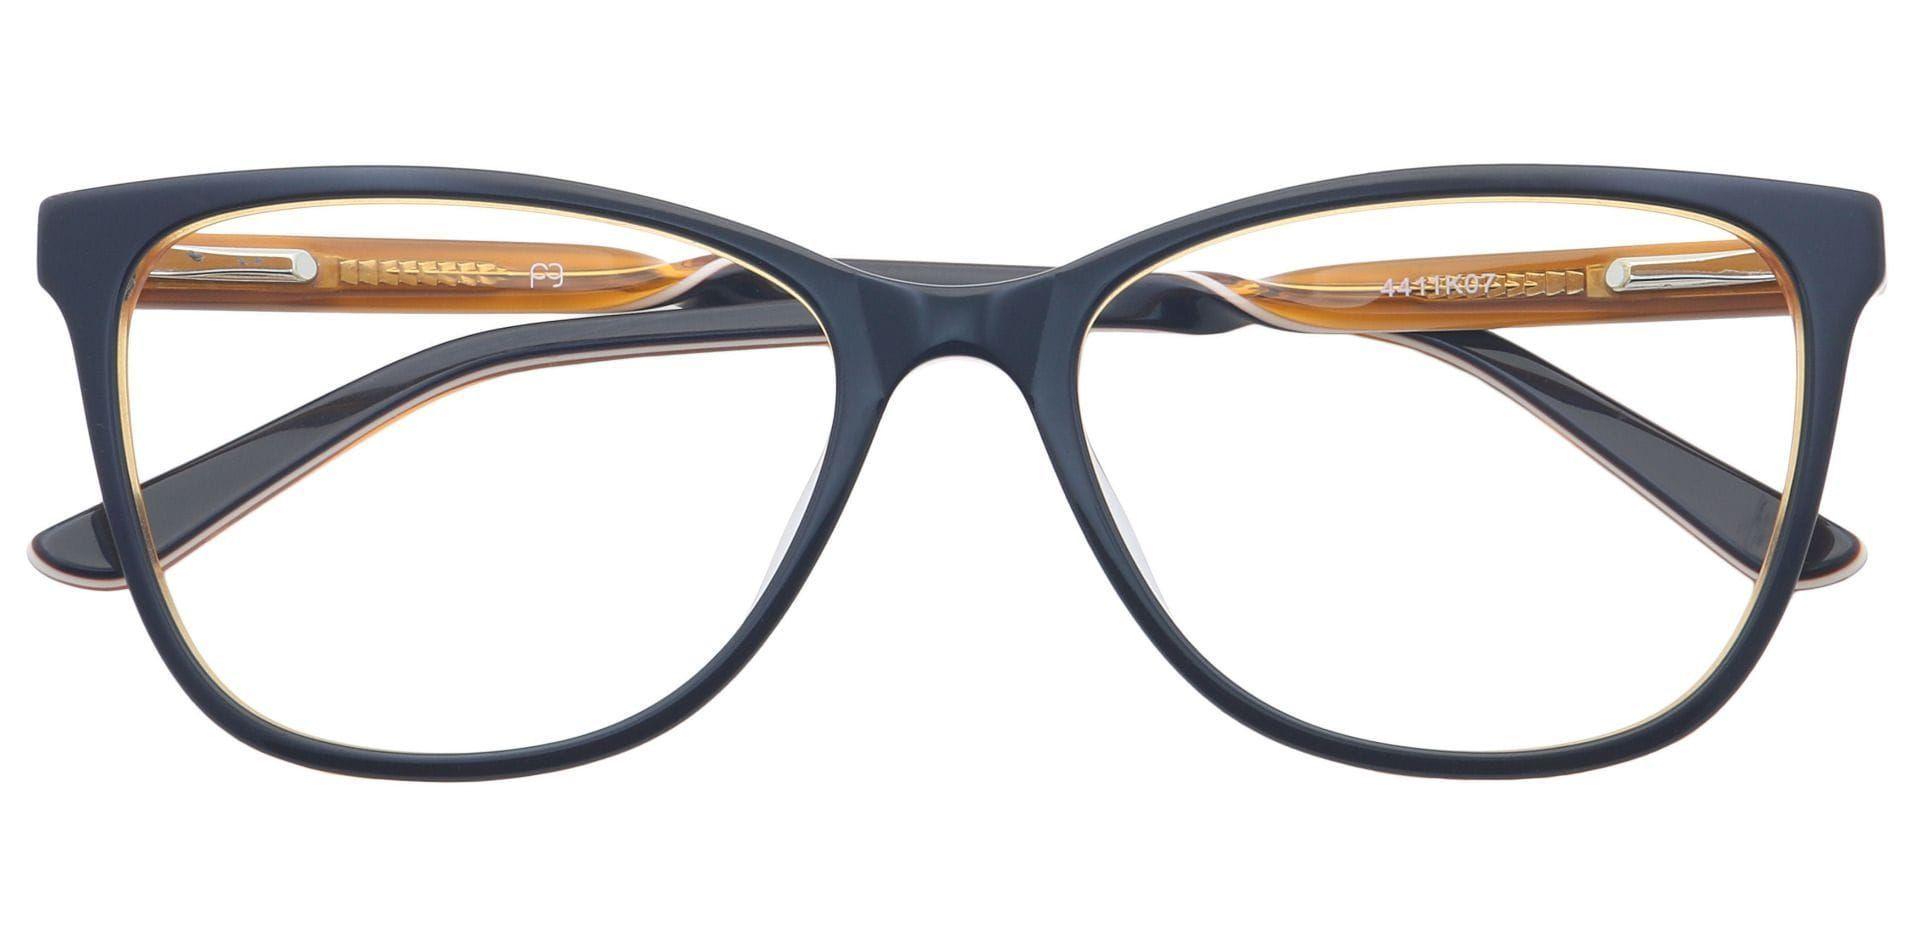 Cindy Oval Prescription Glasses - Black